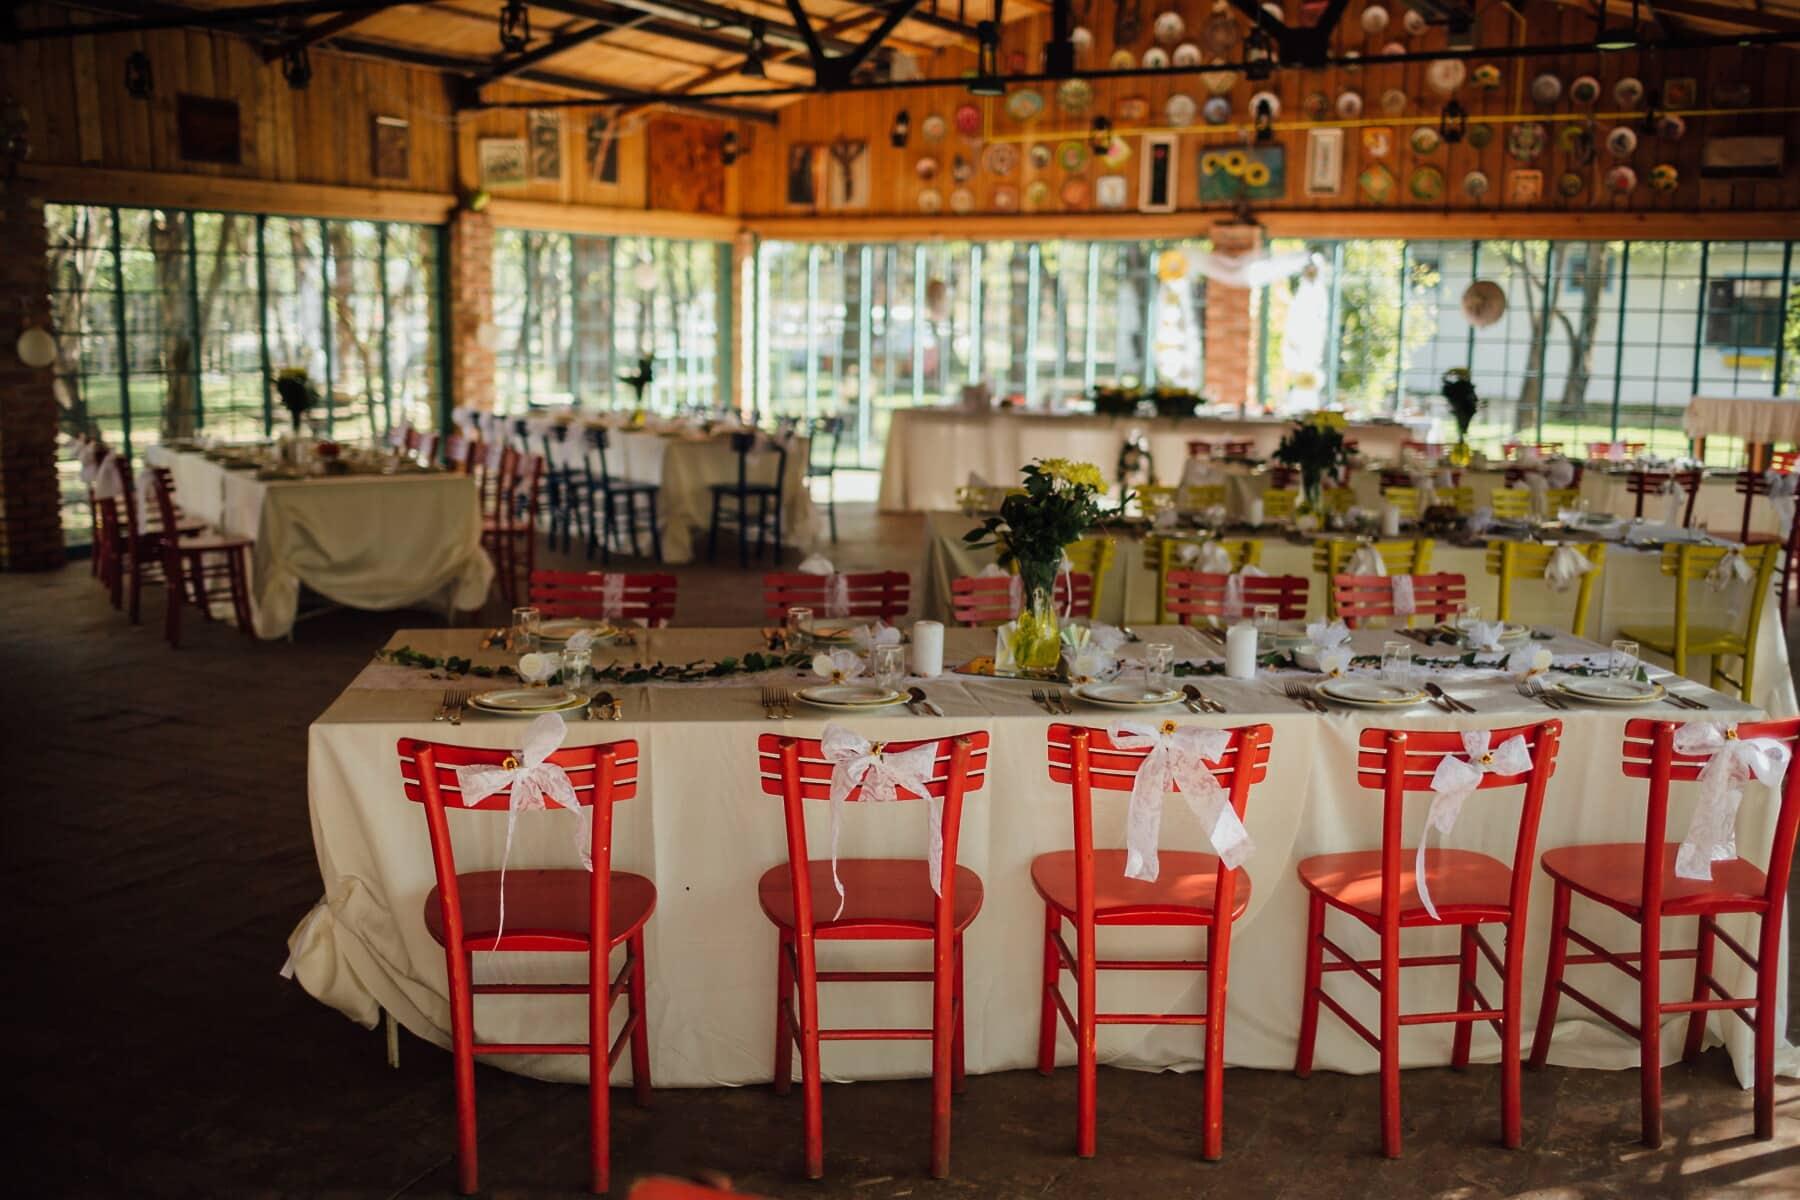 vintage, furniture, wedding venue, restaurant, empty, dining, chair, seat, building, cafeteria